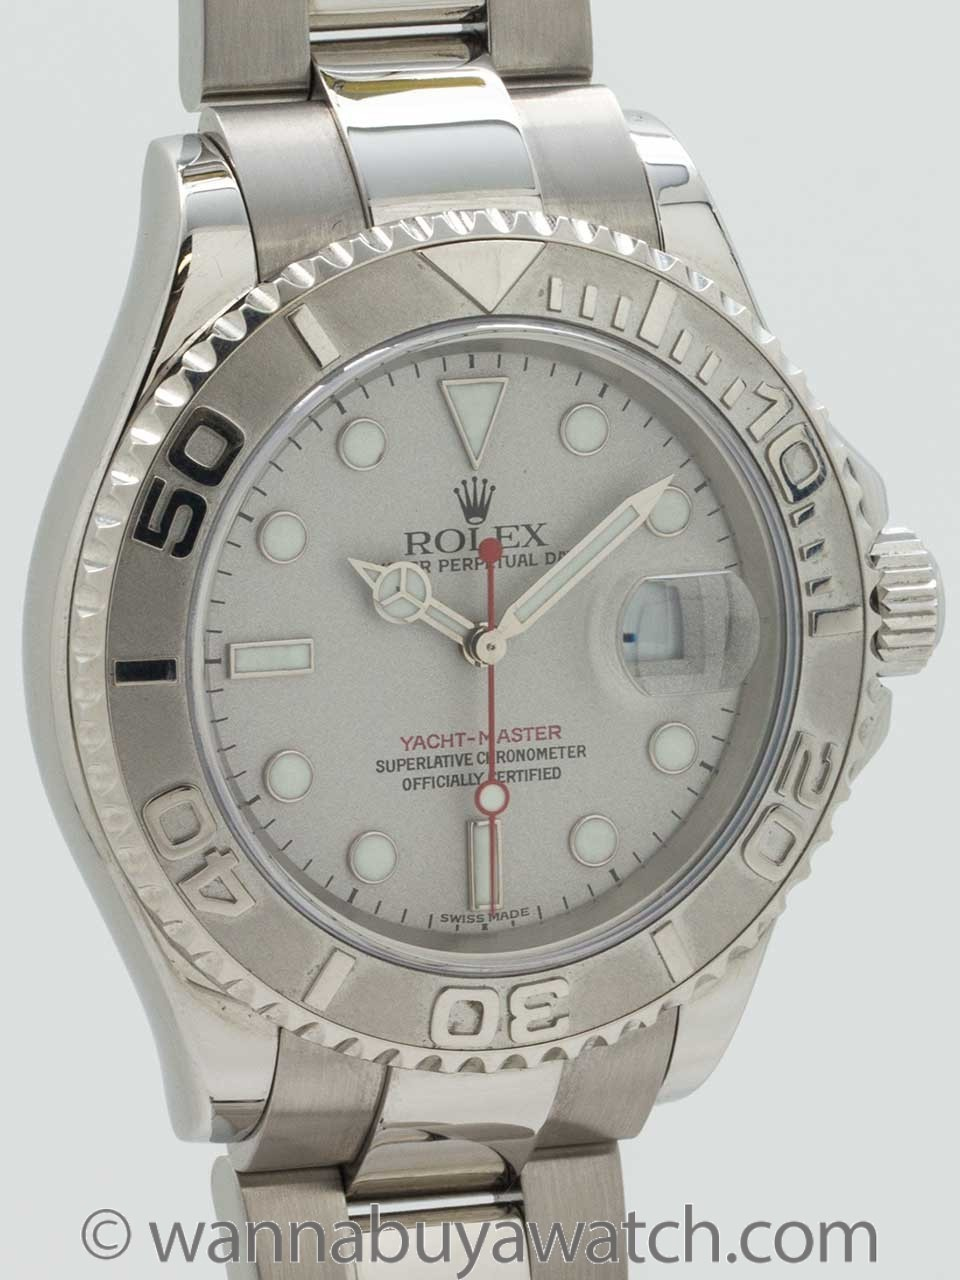 Rolex Man's Platinum Yachtmaster ref 16622 Box & Papers circa 2002